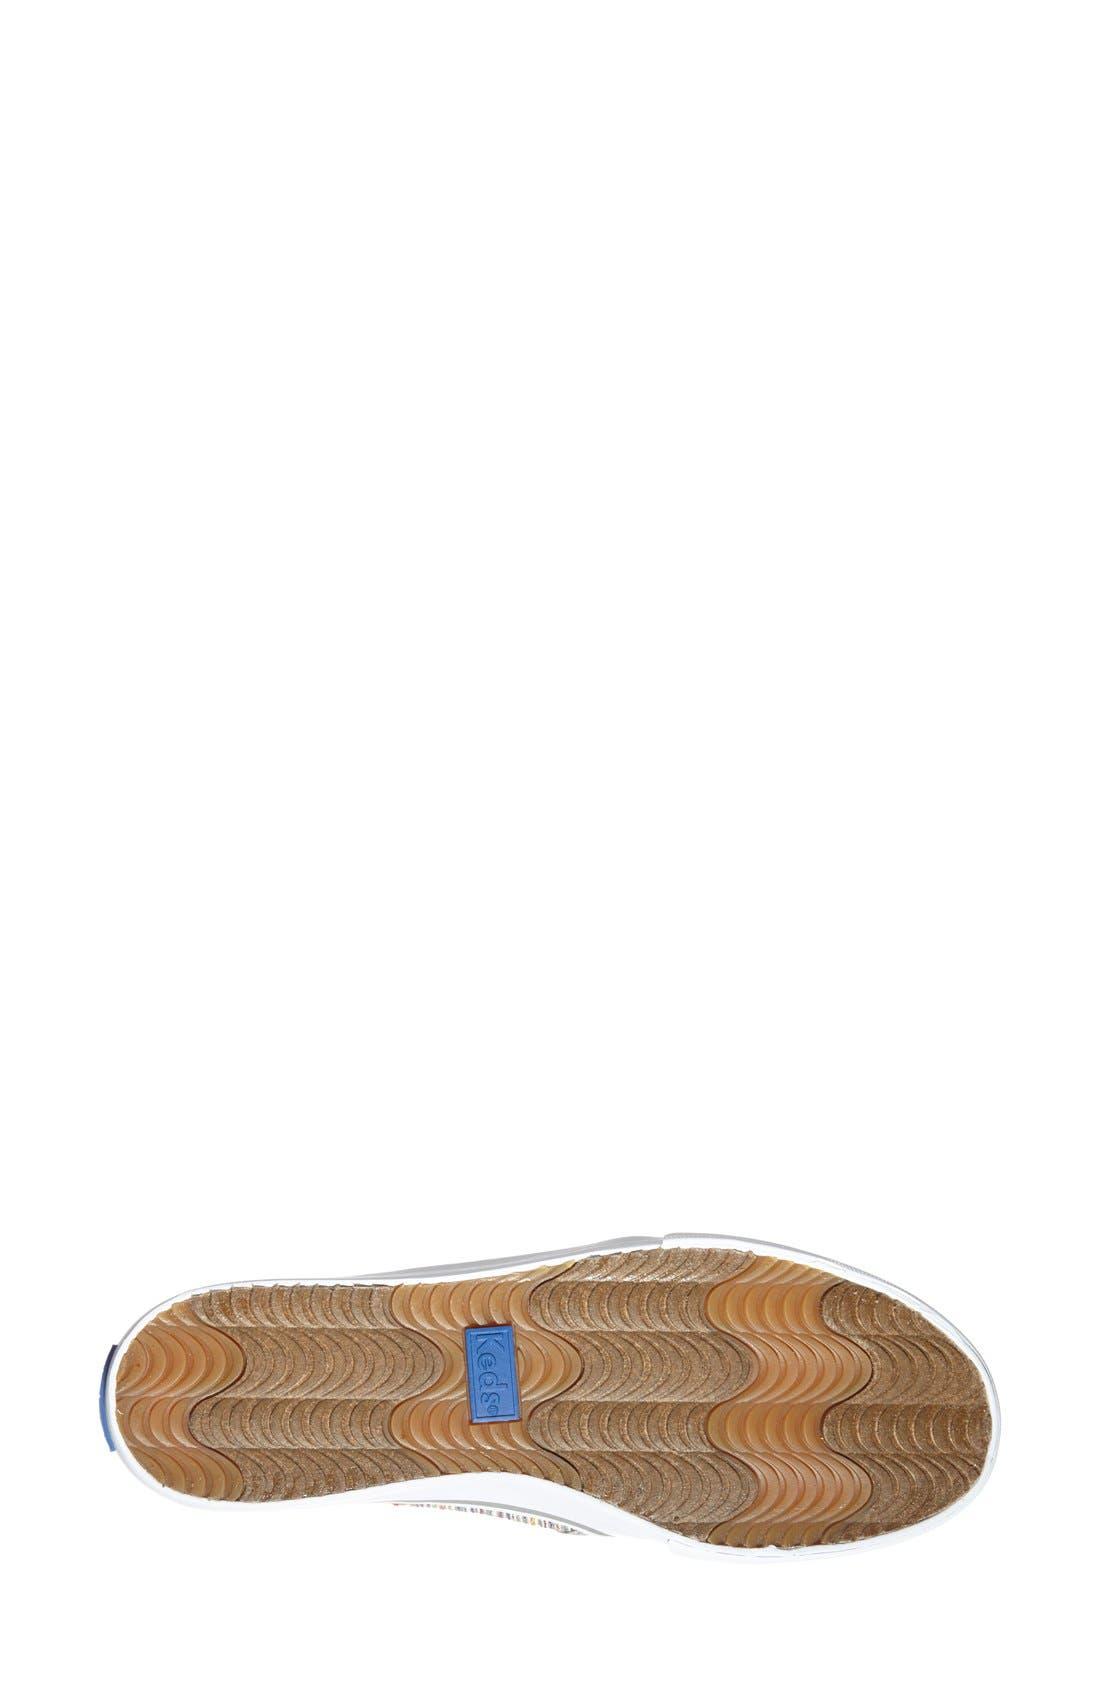 Alternate Image 4  - Keds® 'Double Decker - Woven Stripe' Slip-On Sneaker (Women)